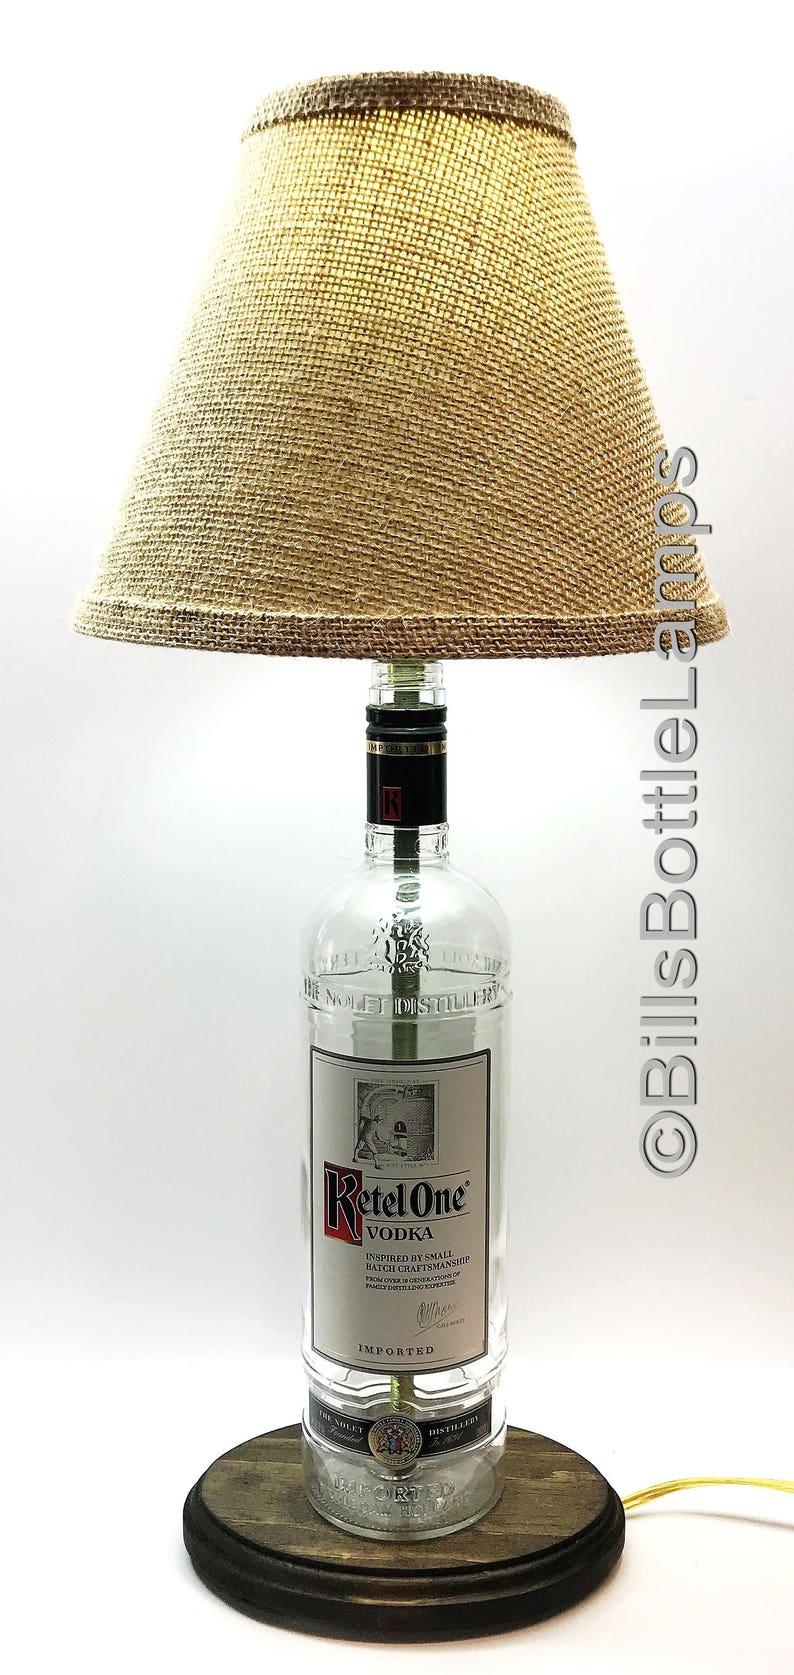 Ketel One Vodka Liquor Bottle TABLE LAMP with Wood Base Desk Accent Light Man Cave Lighting Pub Lounge Decor Home Bar